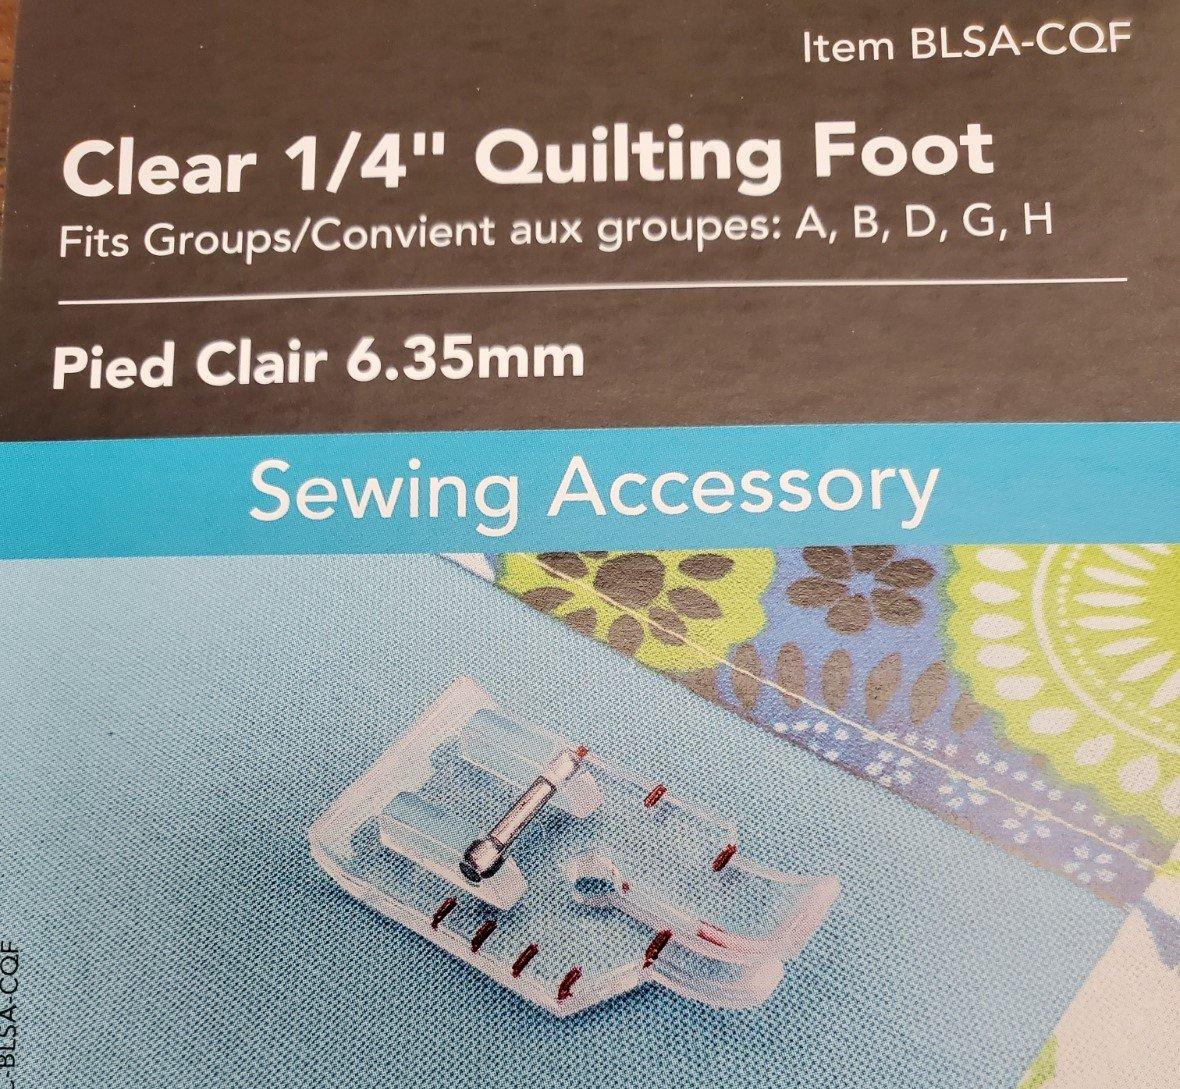 Clear 1/4 Quilting Foot - BLSA